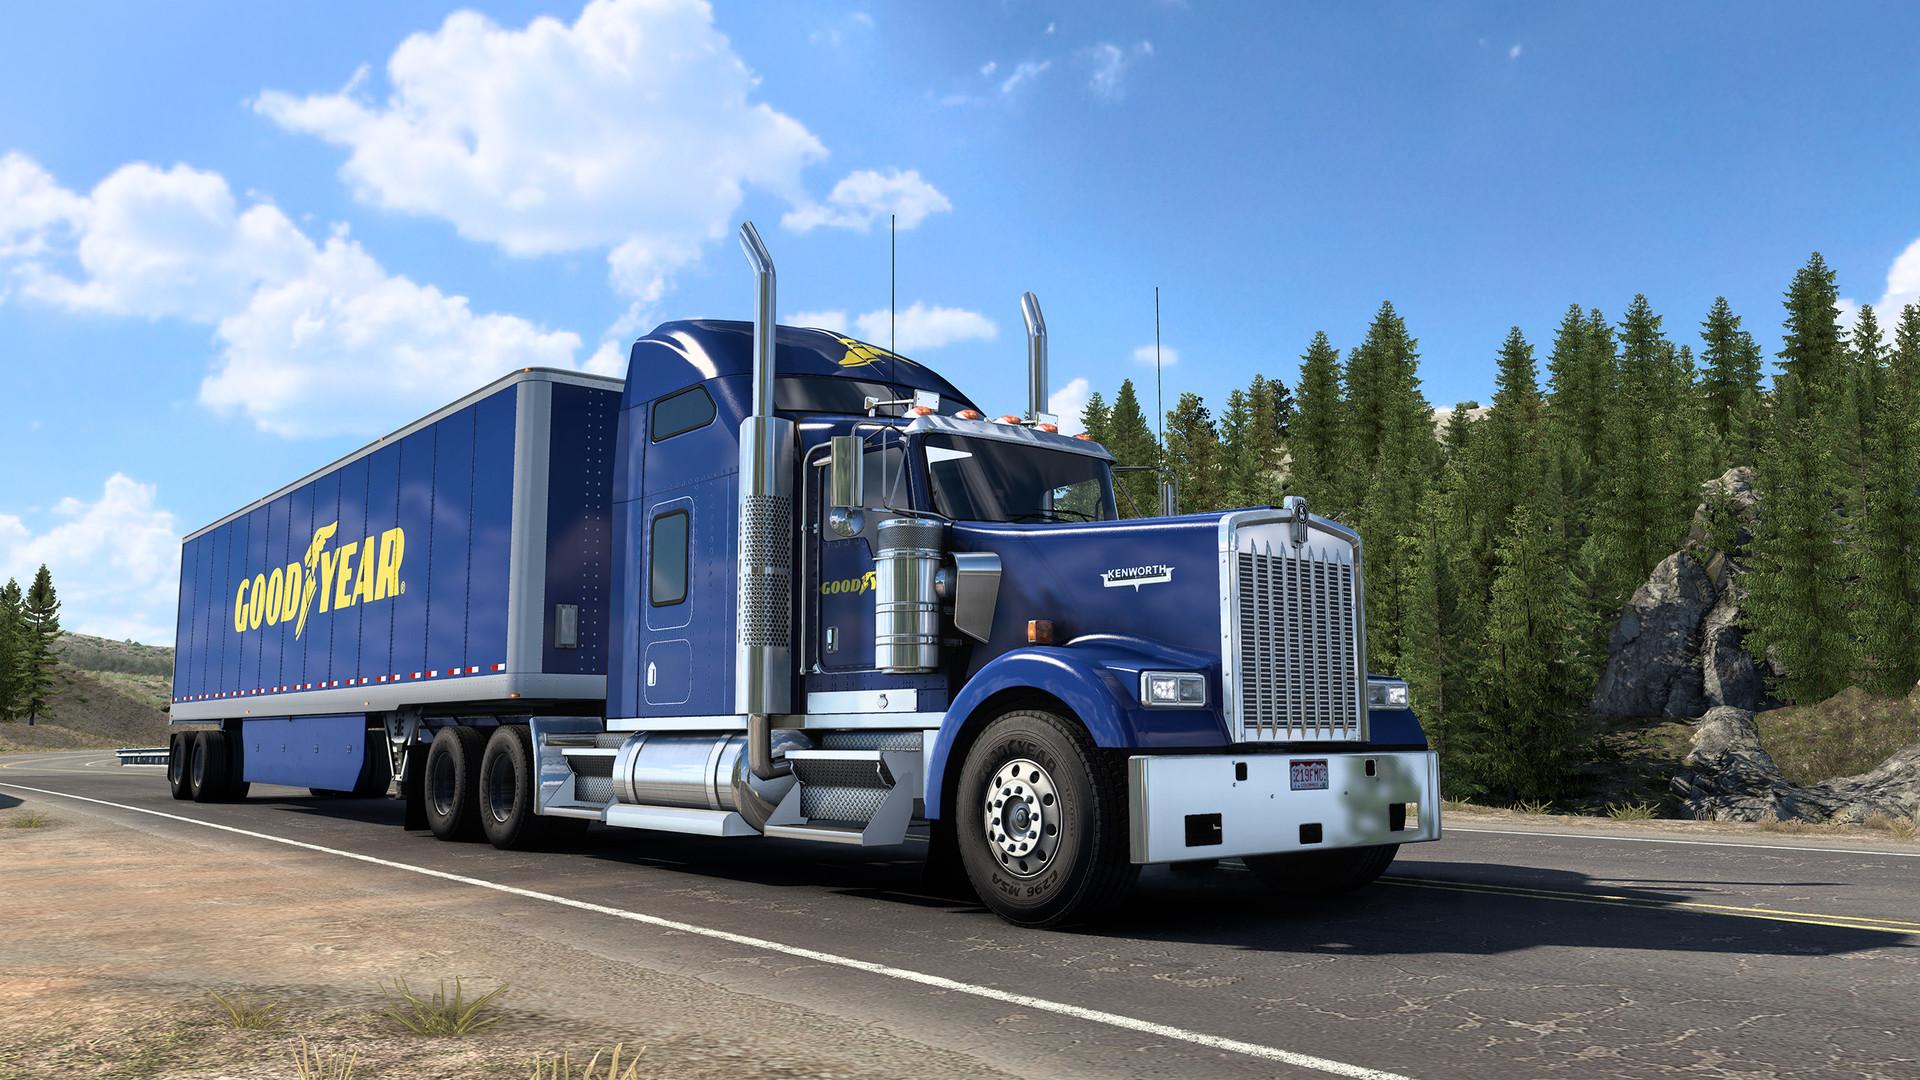 American Truck Simulator - Goodyear Tires Pack PC Key Fiyatları